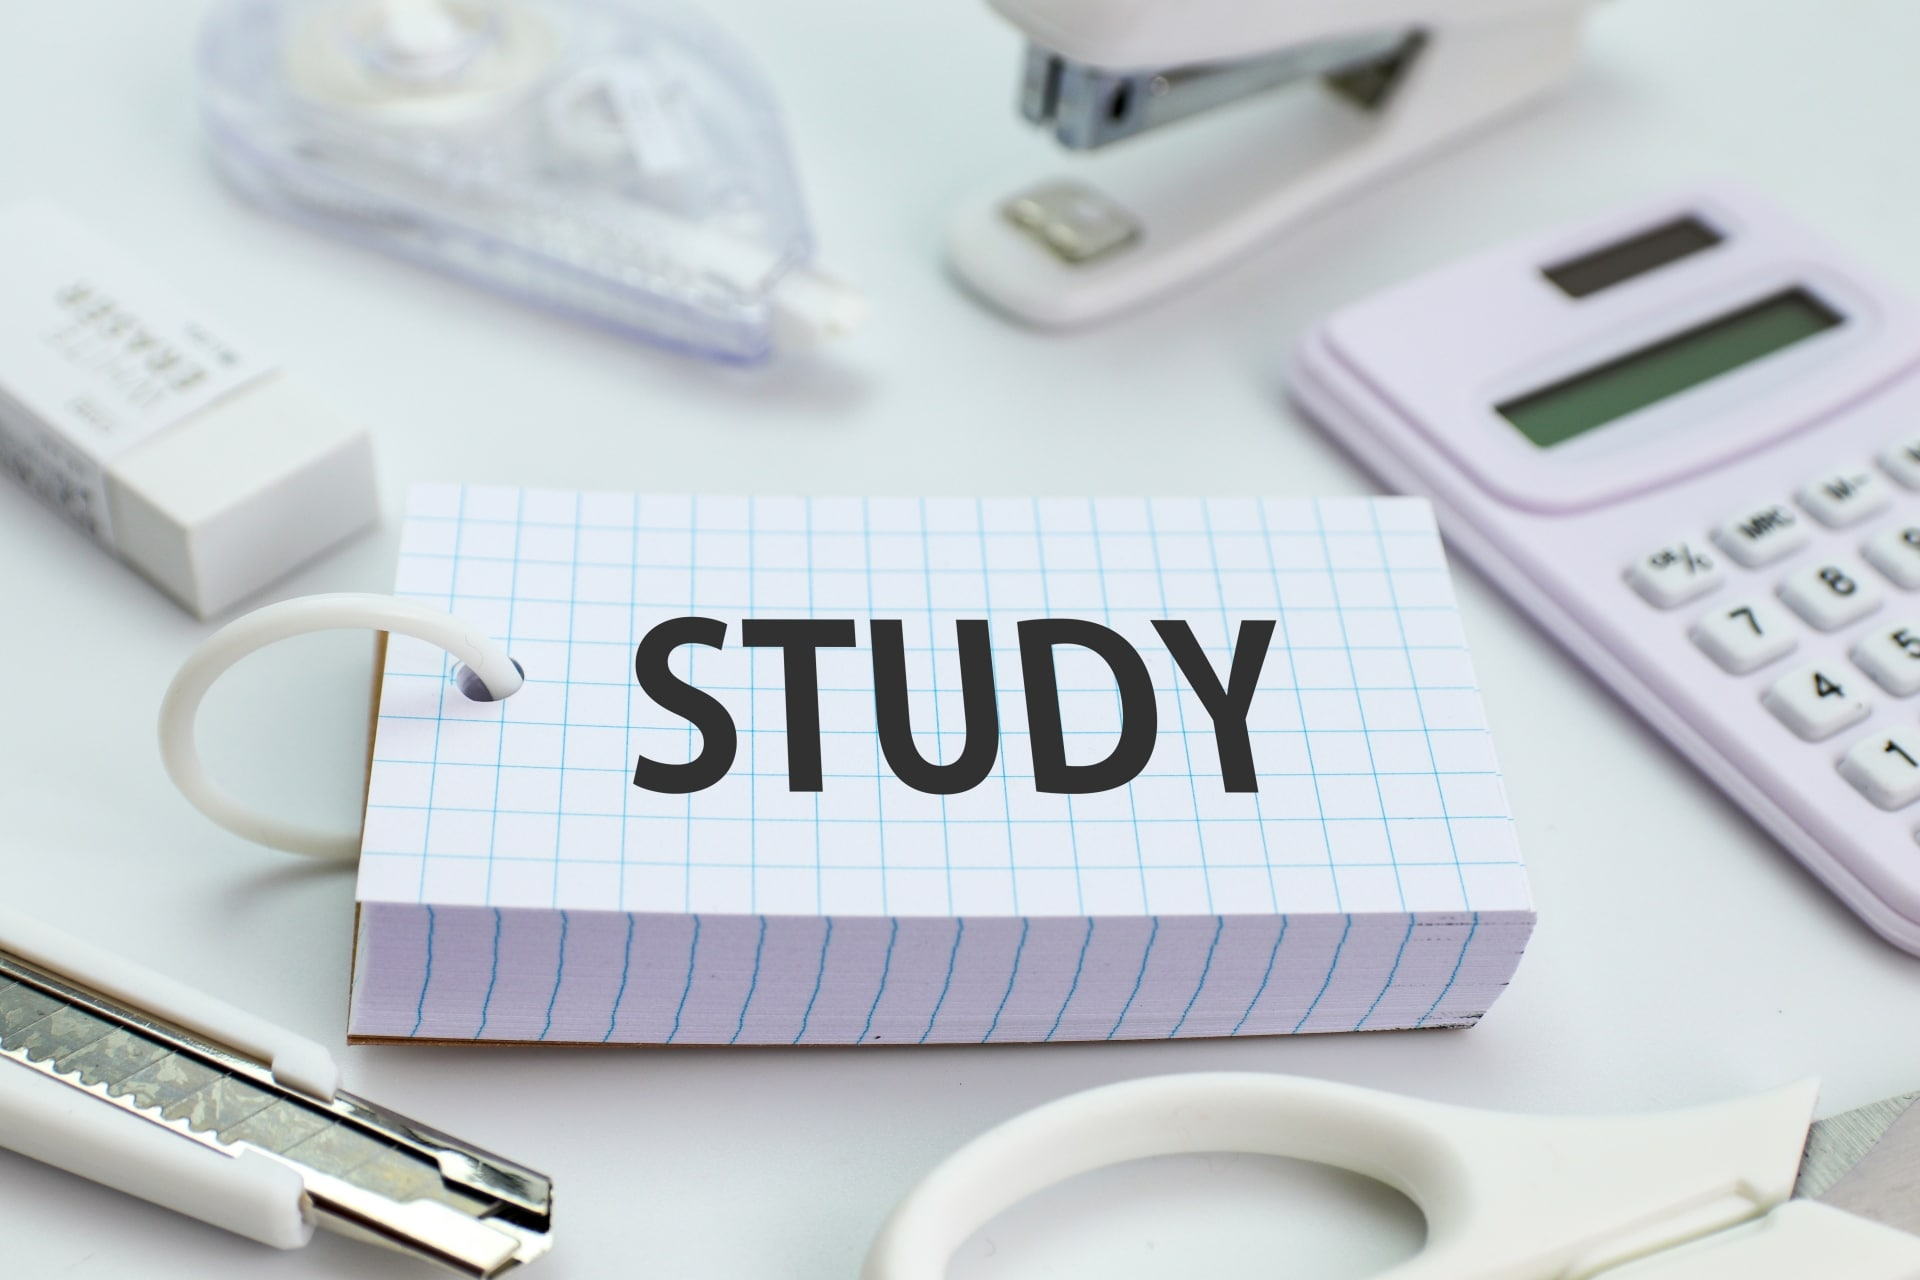 単語帳と文房具